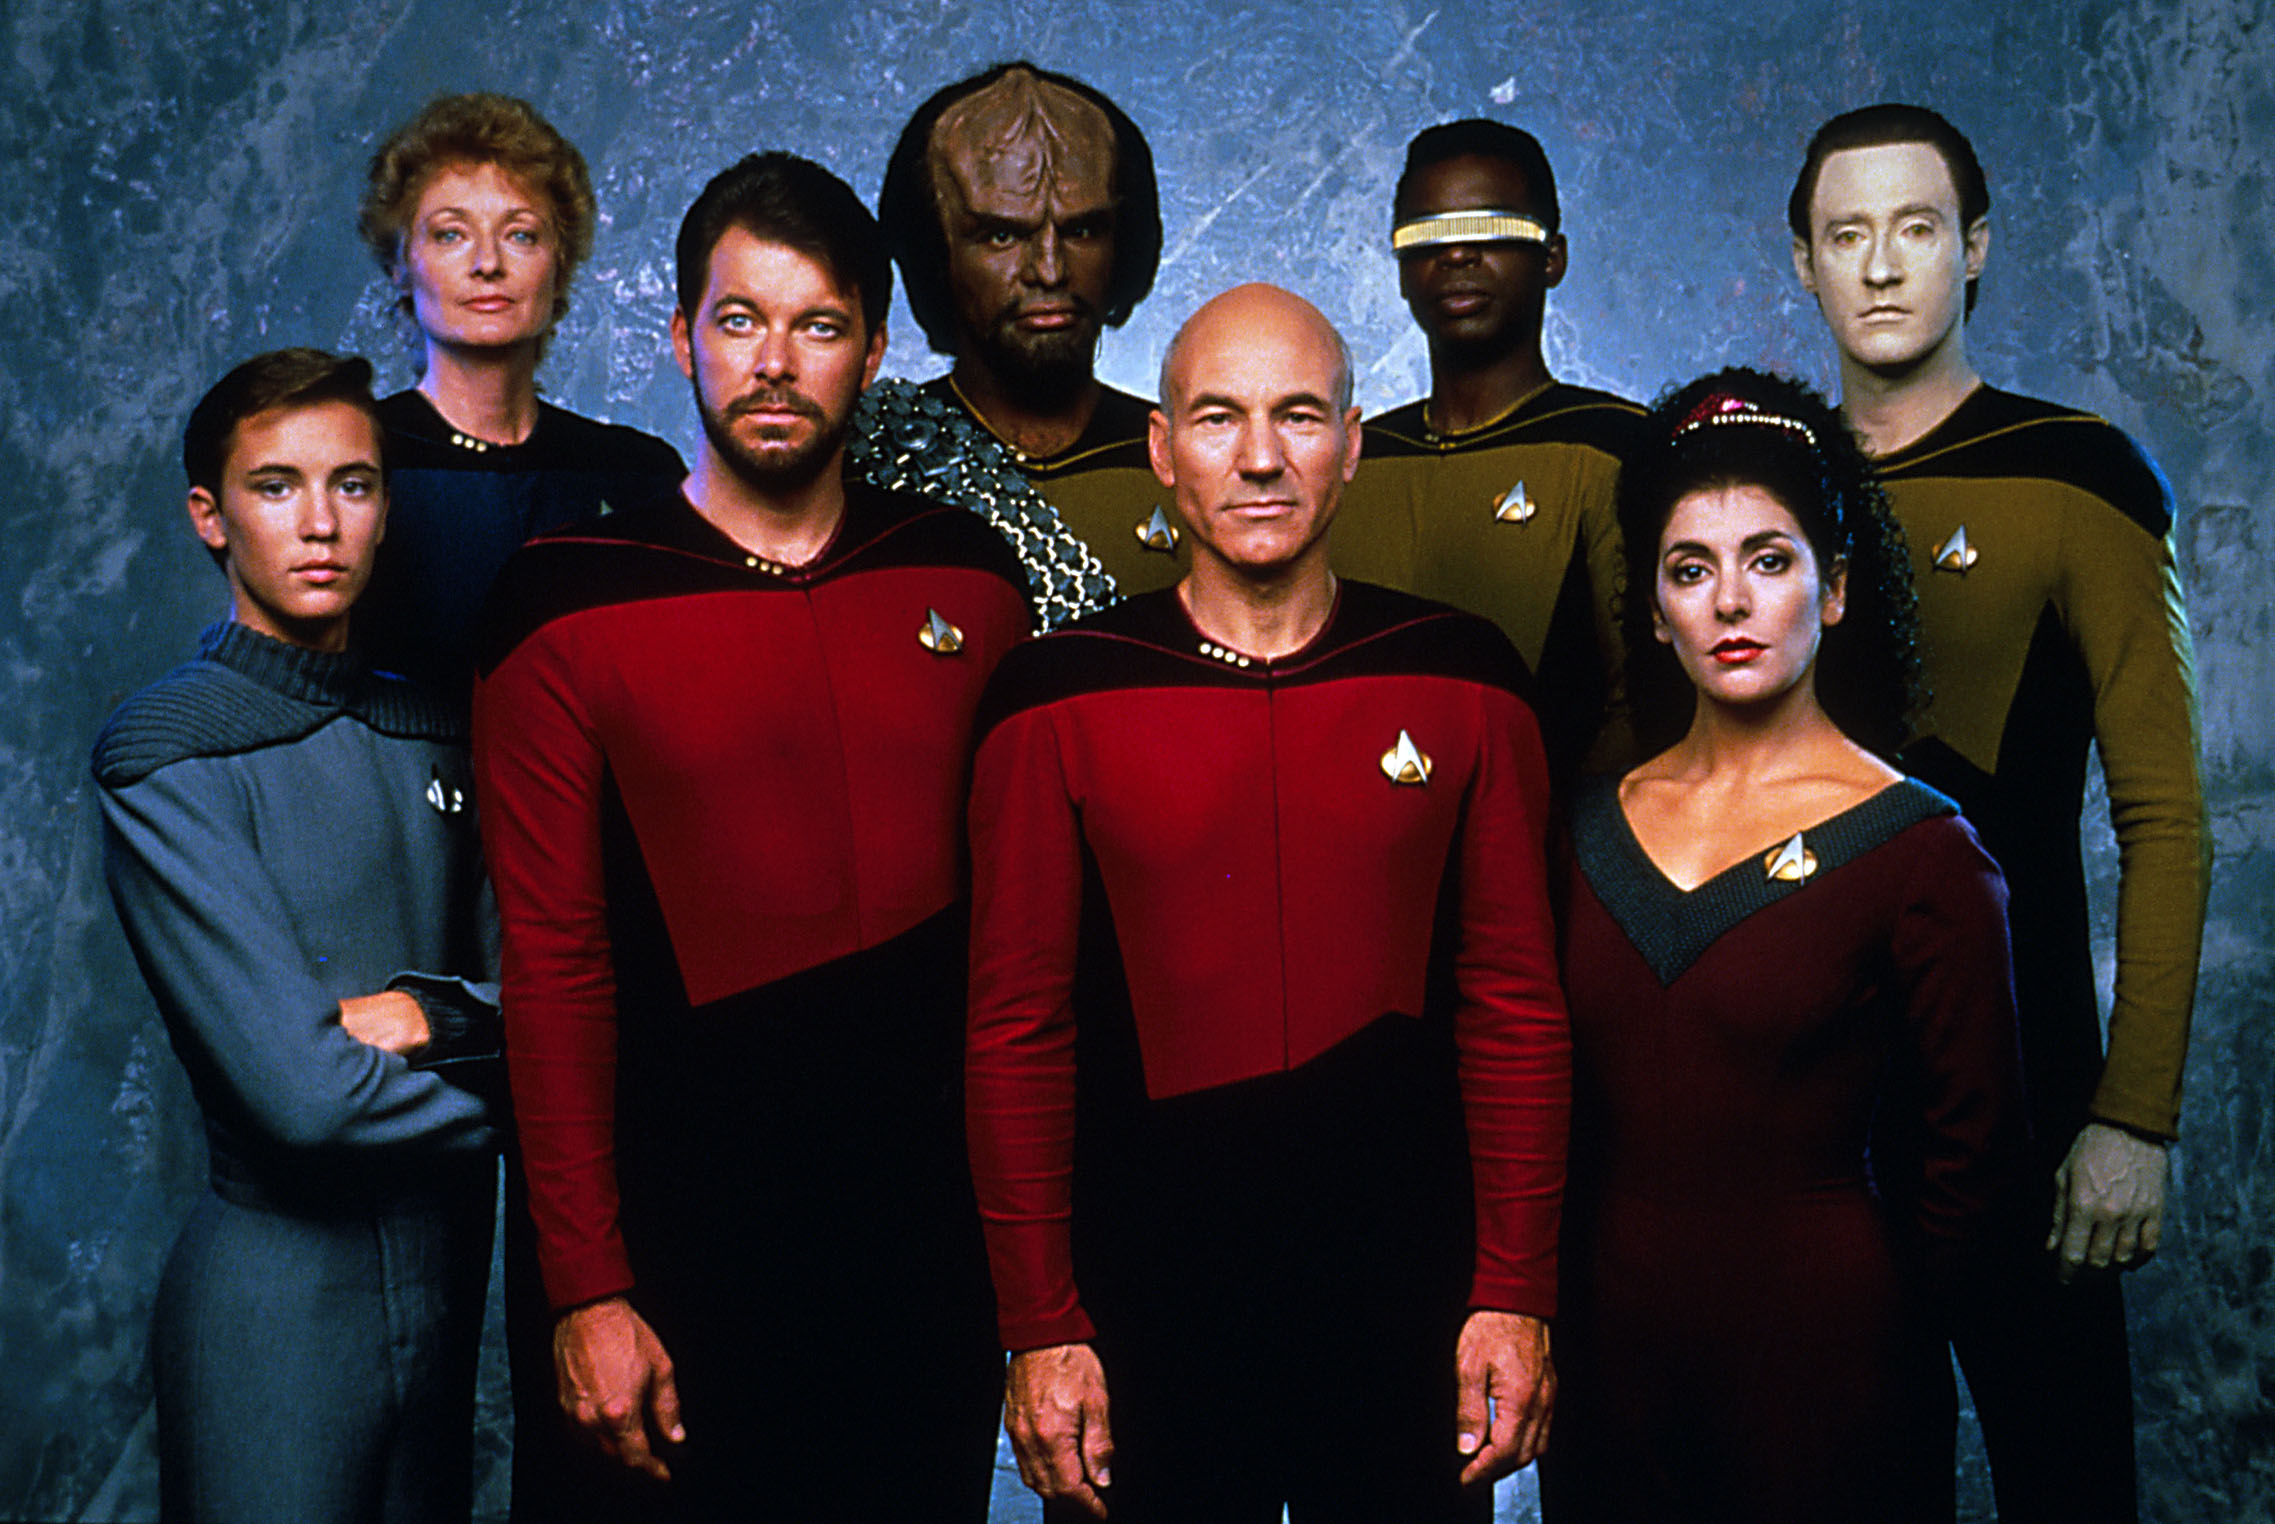 The cast in Season 2